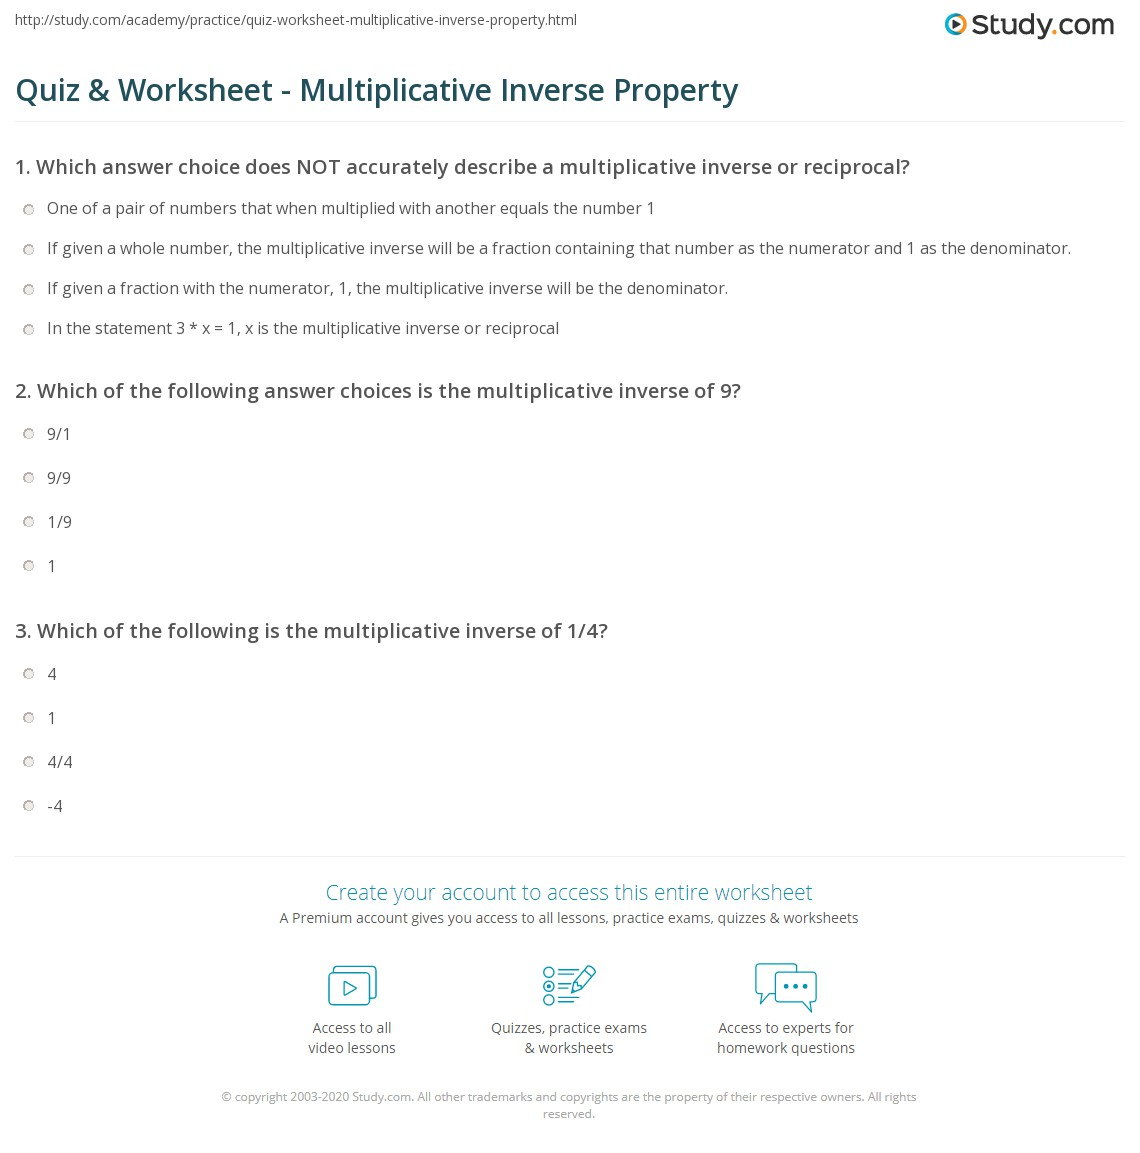 Quiz Worksheet Multiplicative Inverse Property Study